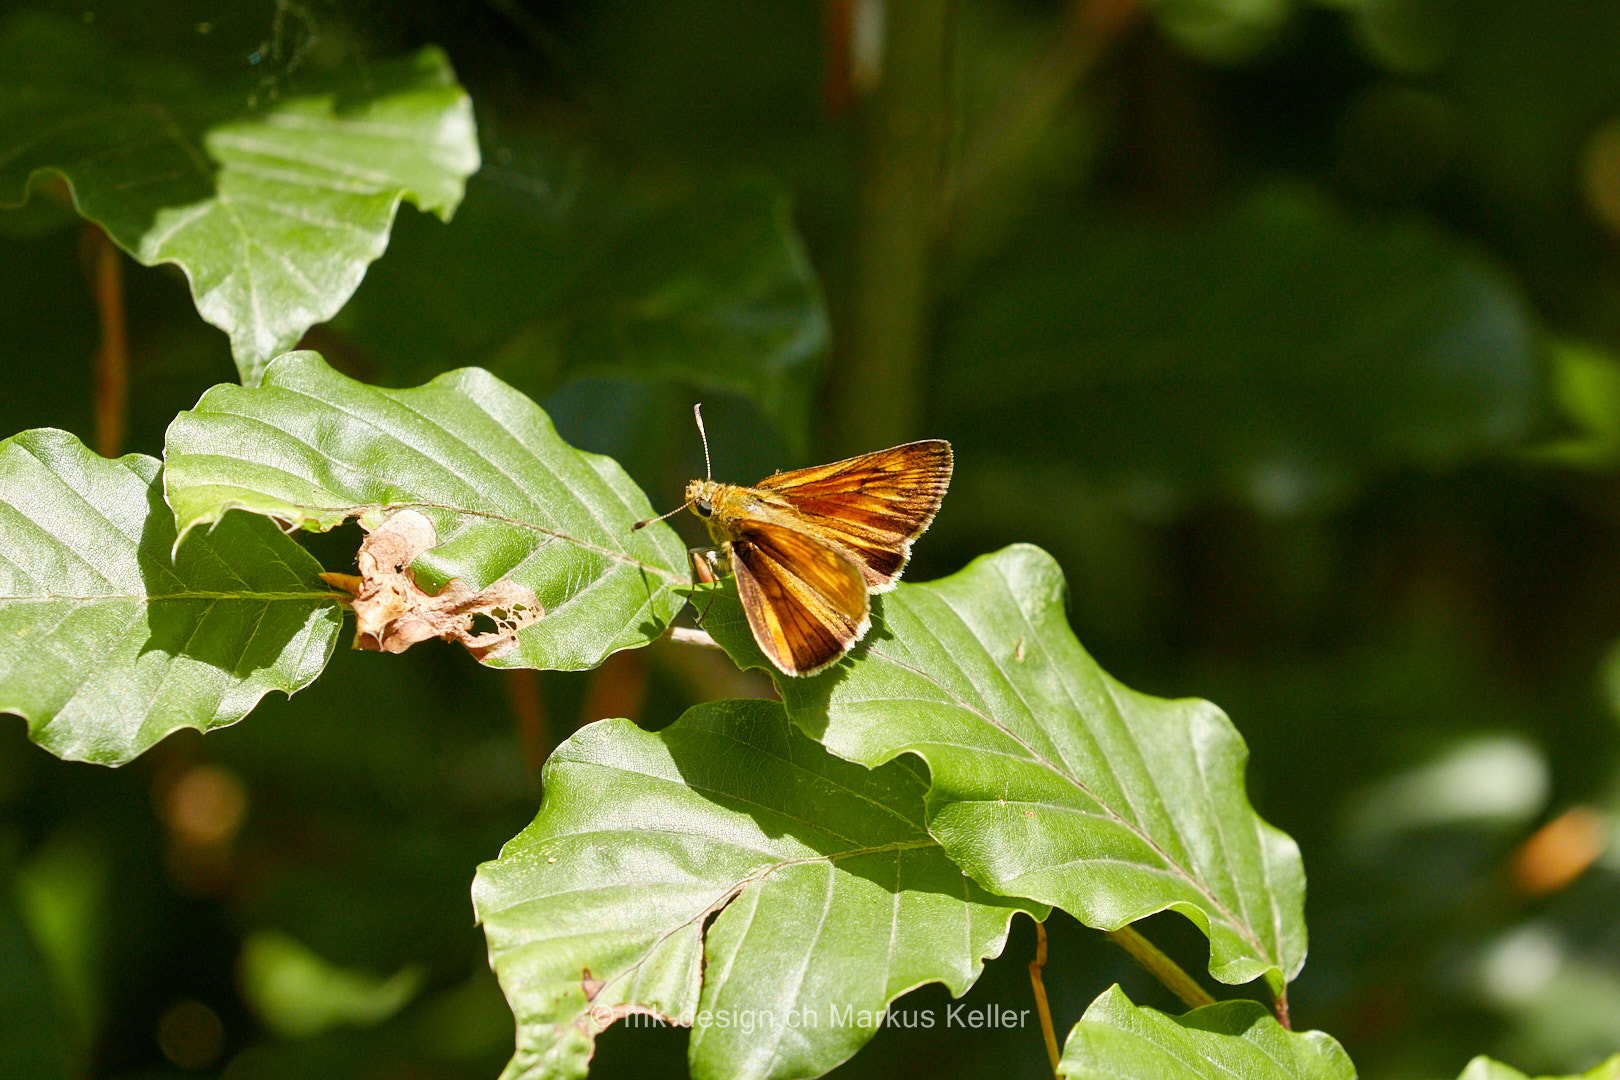 Tier   Insekte   Schmetterling/Raupe   Rostfarbiger Dickkopffalter